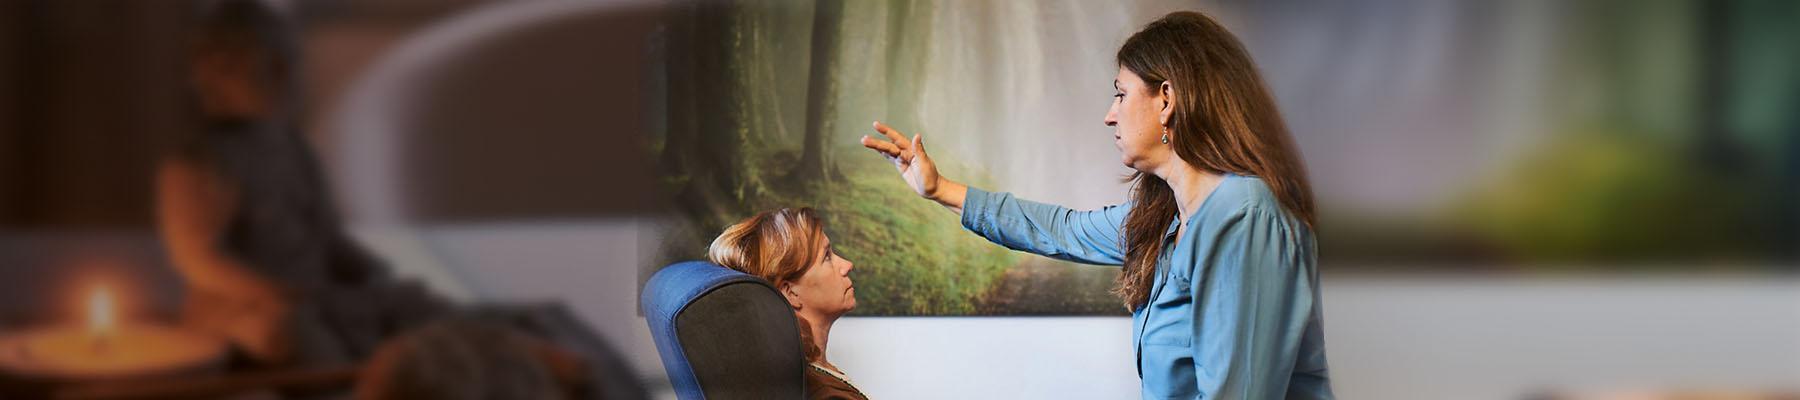 Praxis für Hypnose Hannover, Jasmin Thiele